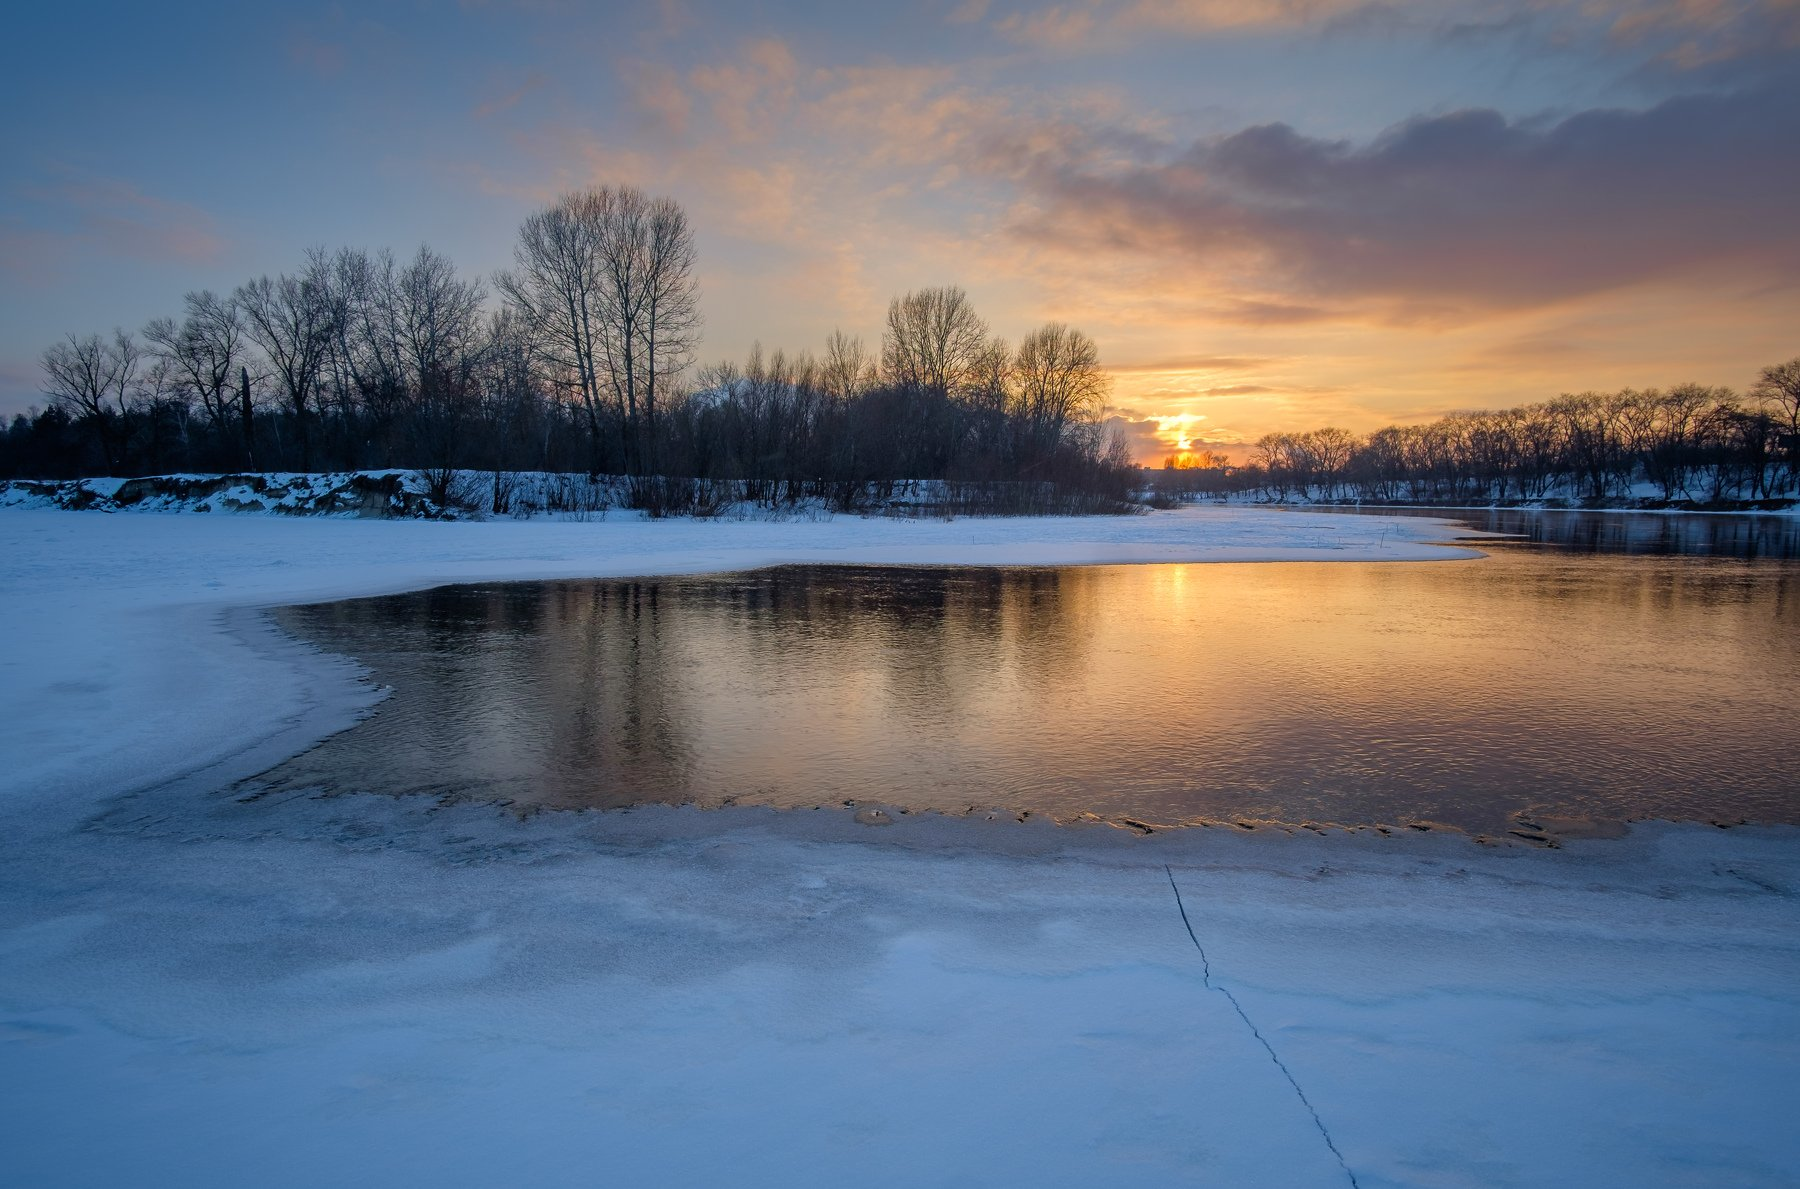 пейзаж,природа,река,зима,снег,мороз,landscape,nature,rivers,frosty,sunset, Александр Арендарь